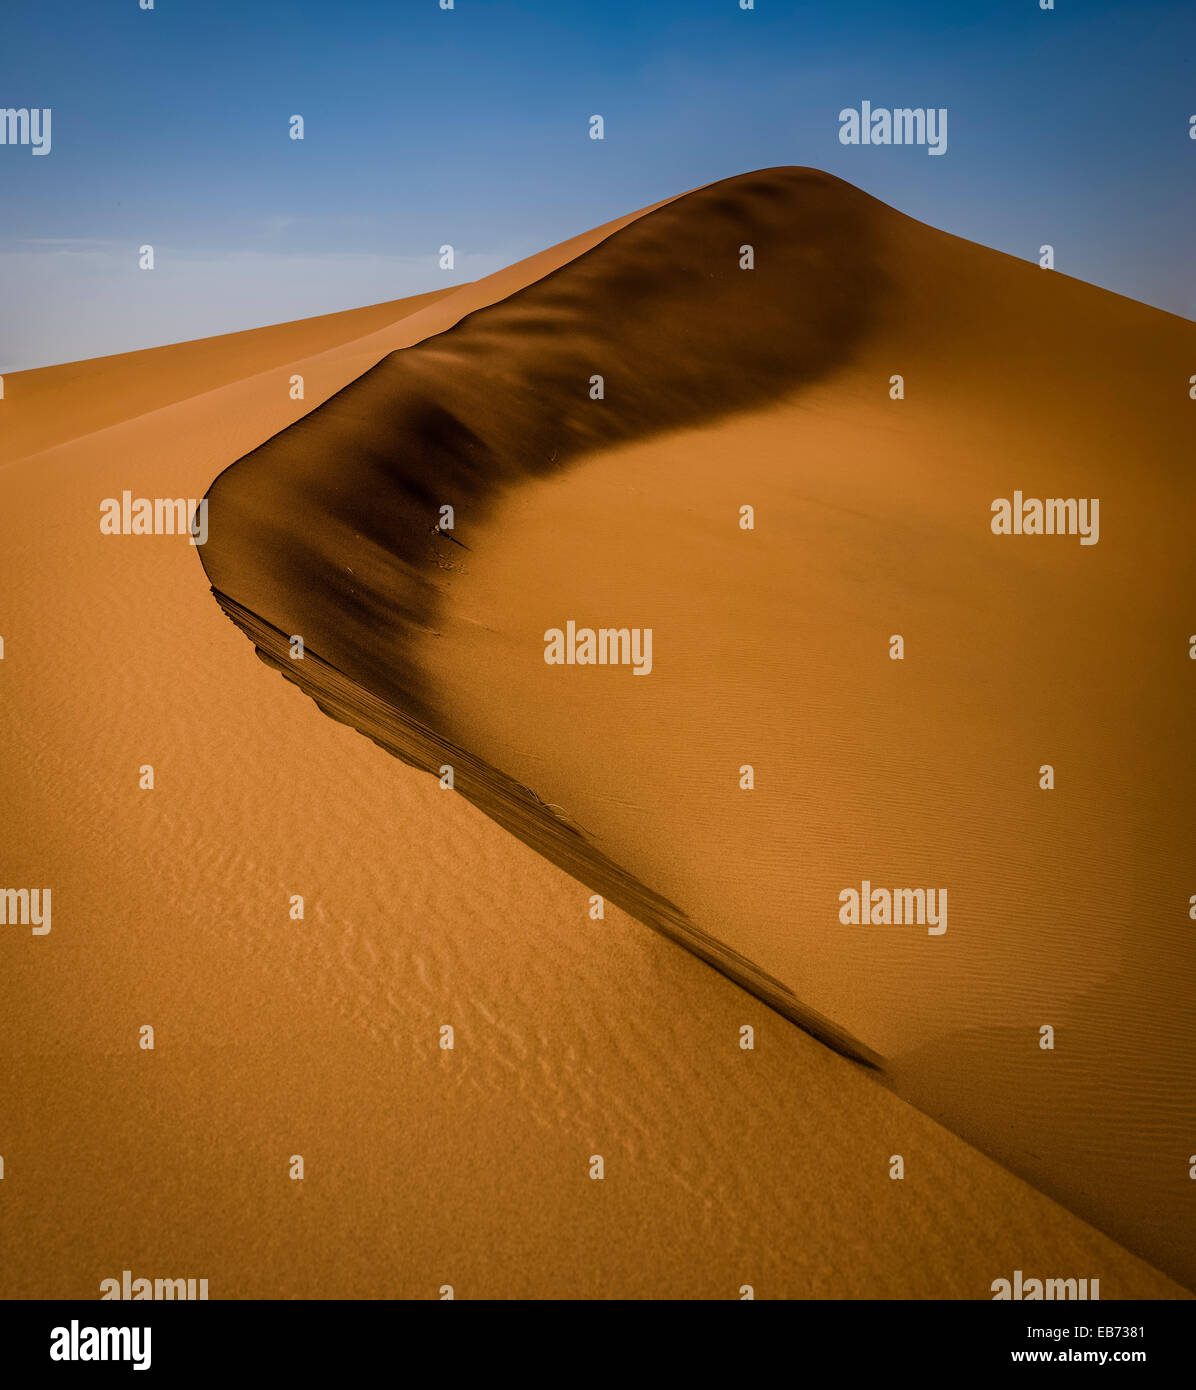 Deserto del Sahara ERG ZHAR MAROCCO AFRICA DUNE Immagini Stock